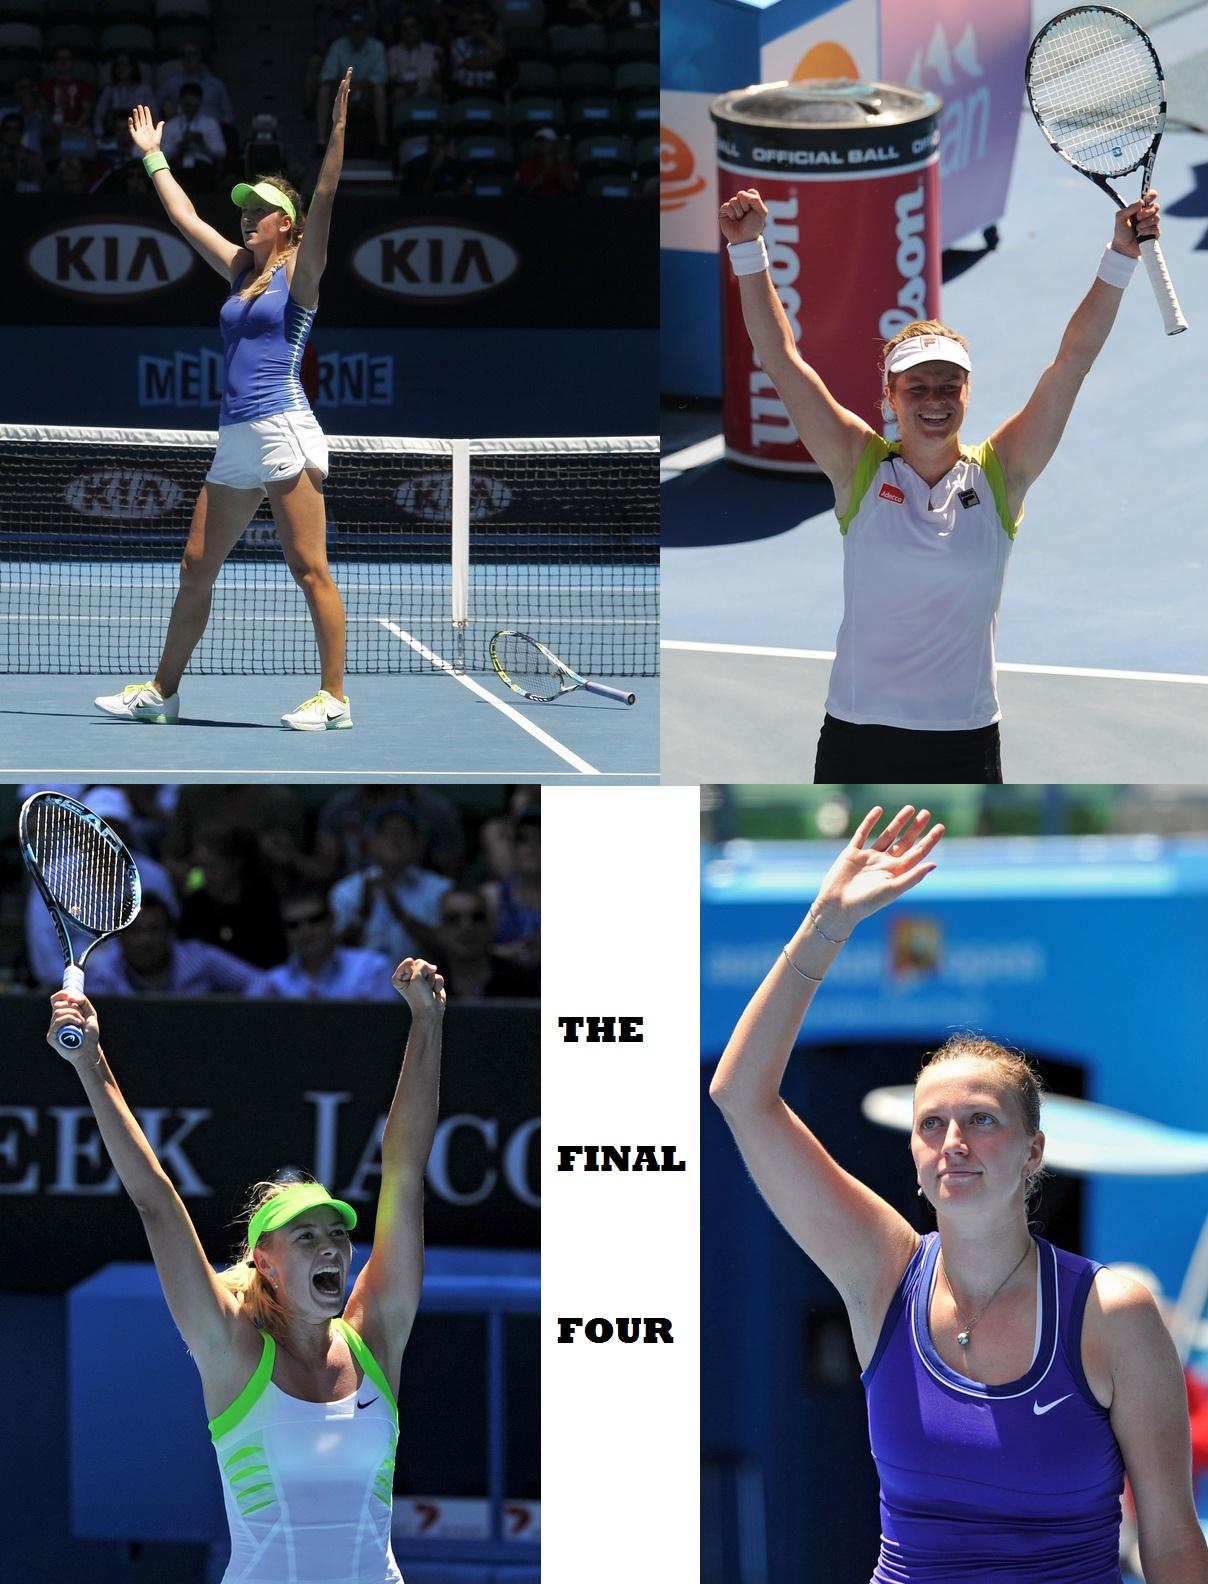 http://4.bp.blogspot.com/-NMIPyrHhqTo/Tx-G7SyaGLI/AAAAAAAADA0/9c7I8lPfGpE/s1600/Azarenka_Clijsters_Sharapova_Kvitova-2.jpg